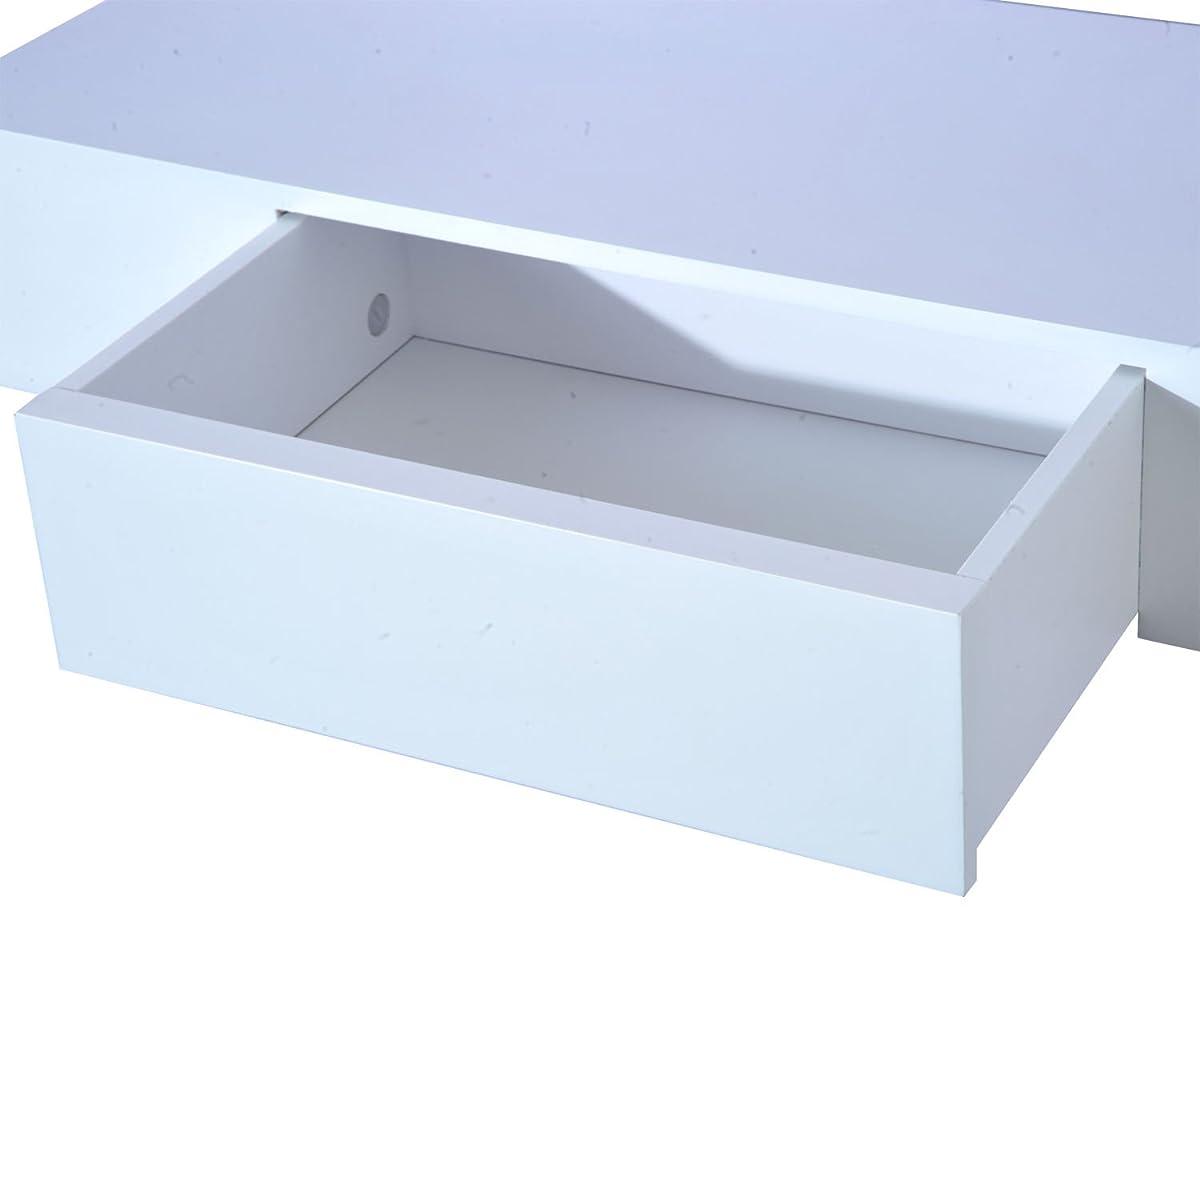 "HOMCOM 24"" Modern Wall Mounted Floating Storage Shelf with Small Hidden Drawer"